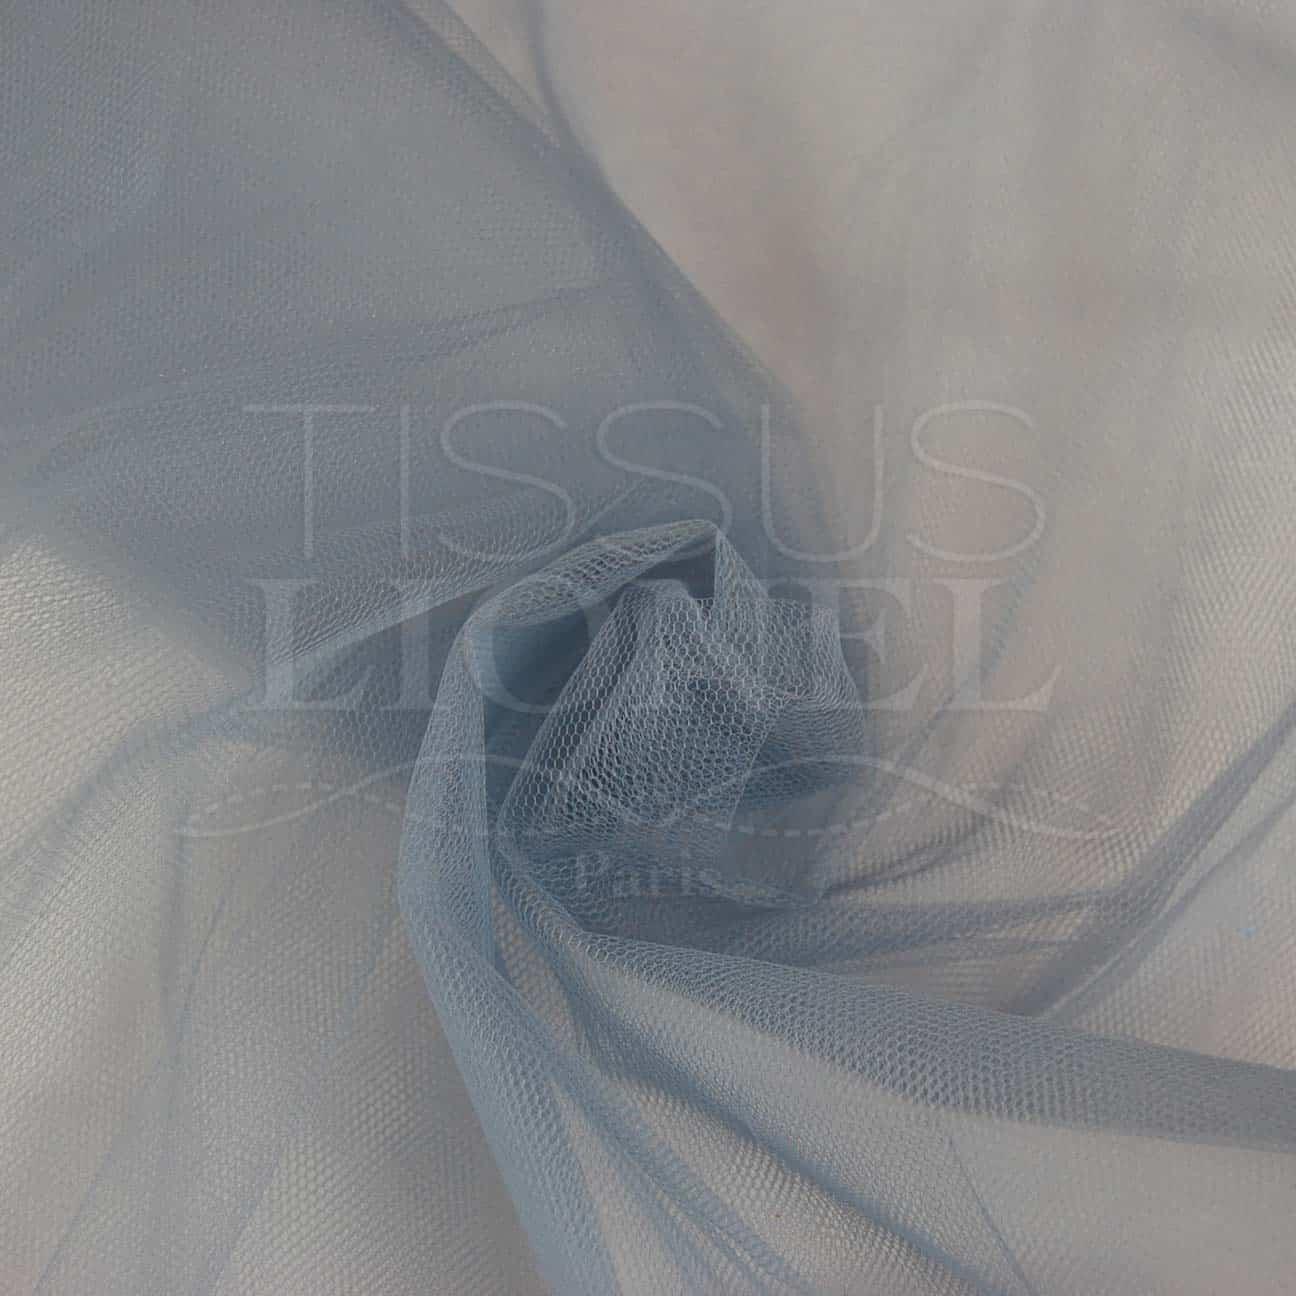 ee4c03ef0531 Morbido tulle BLU GRIGIO - Lionel Tessuti